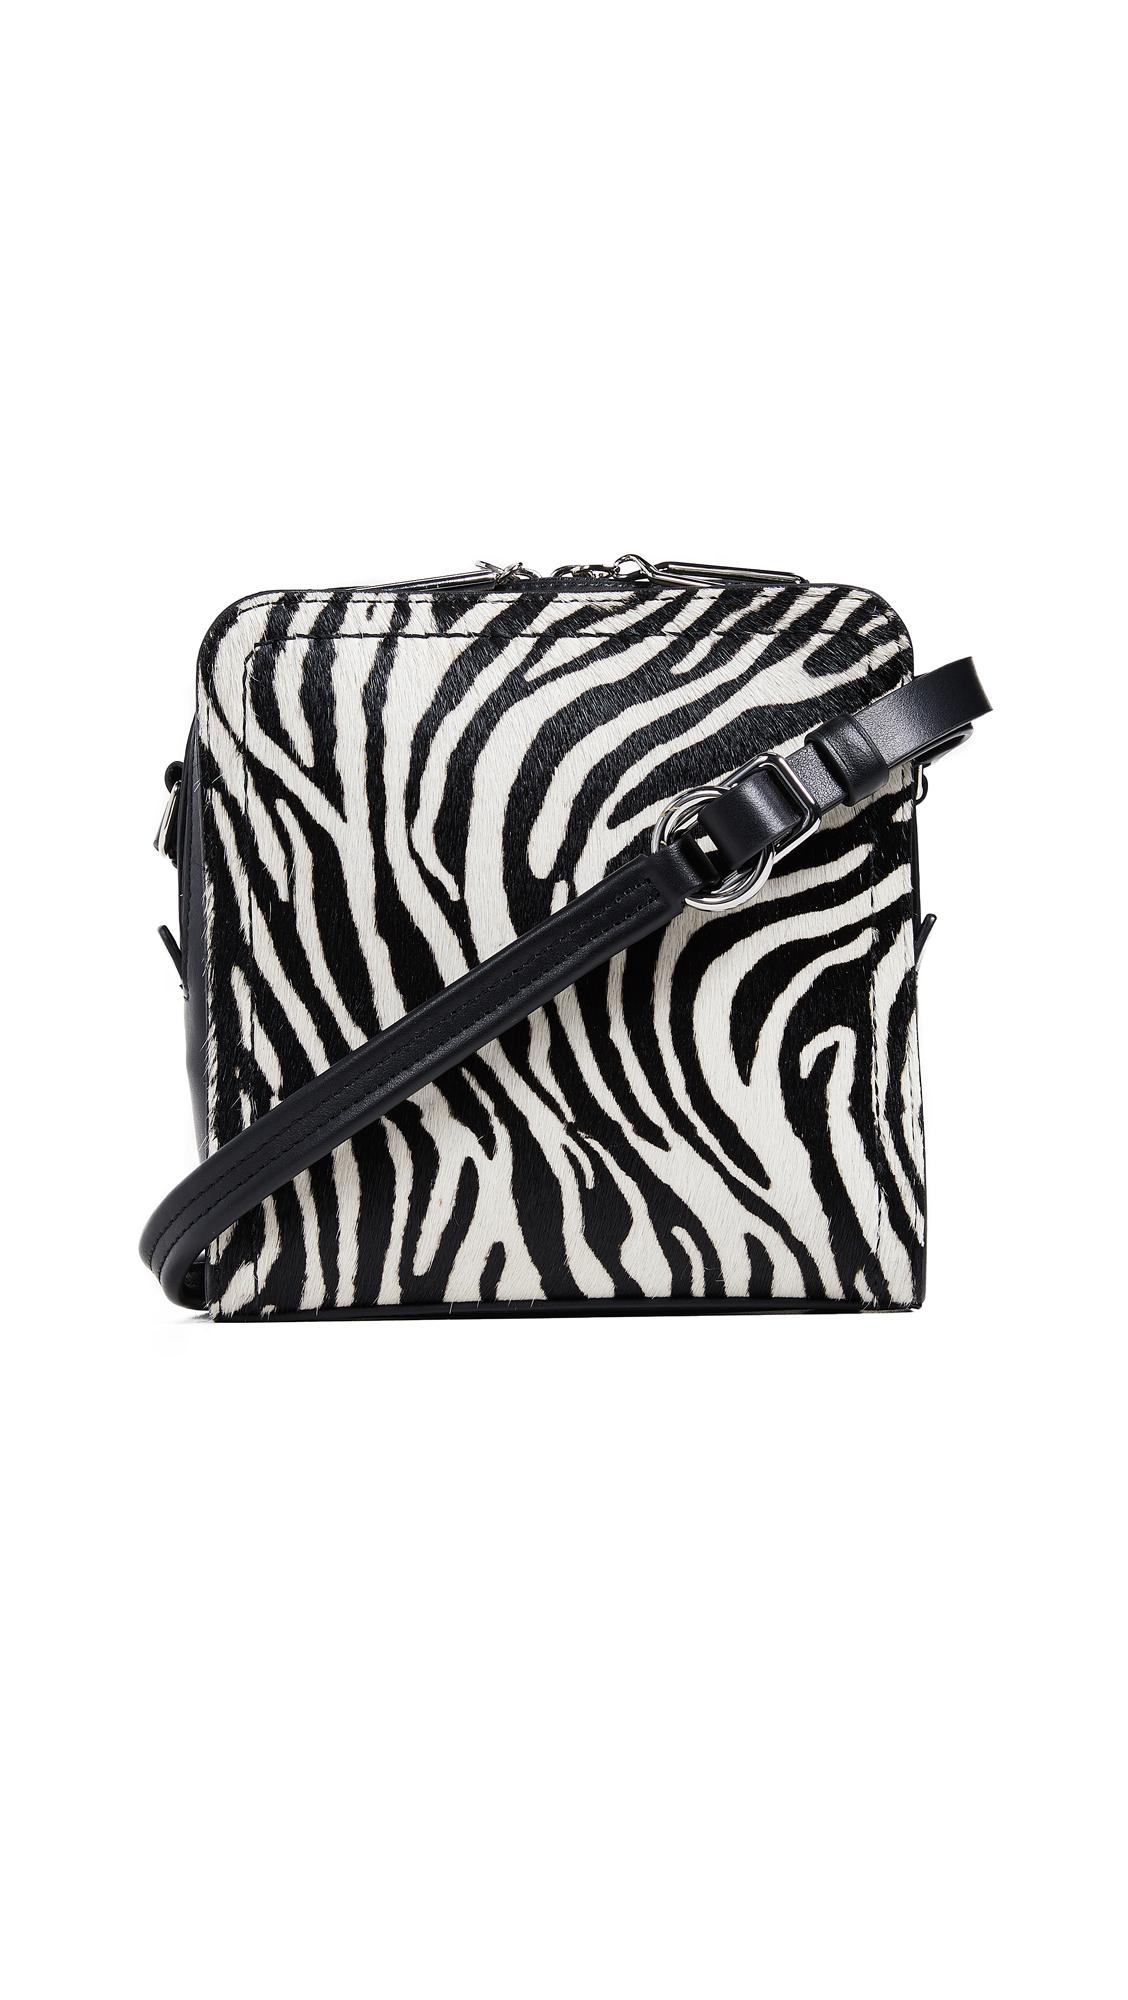 Mini Hudson Genuine Calf Hair & Leather Crossbody Bag - White, Black/White